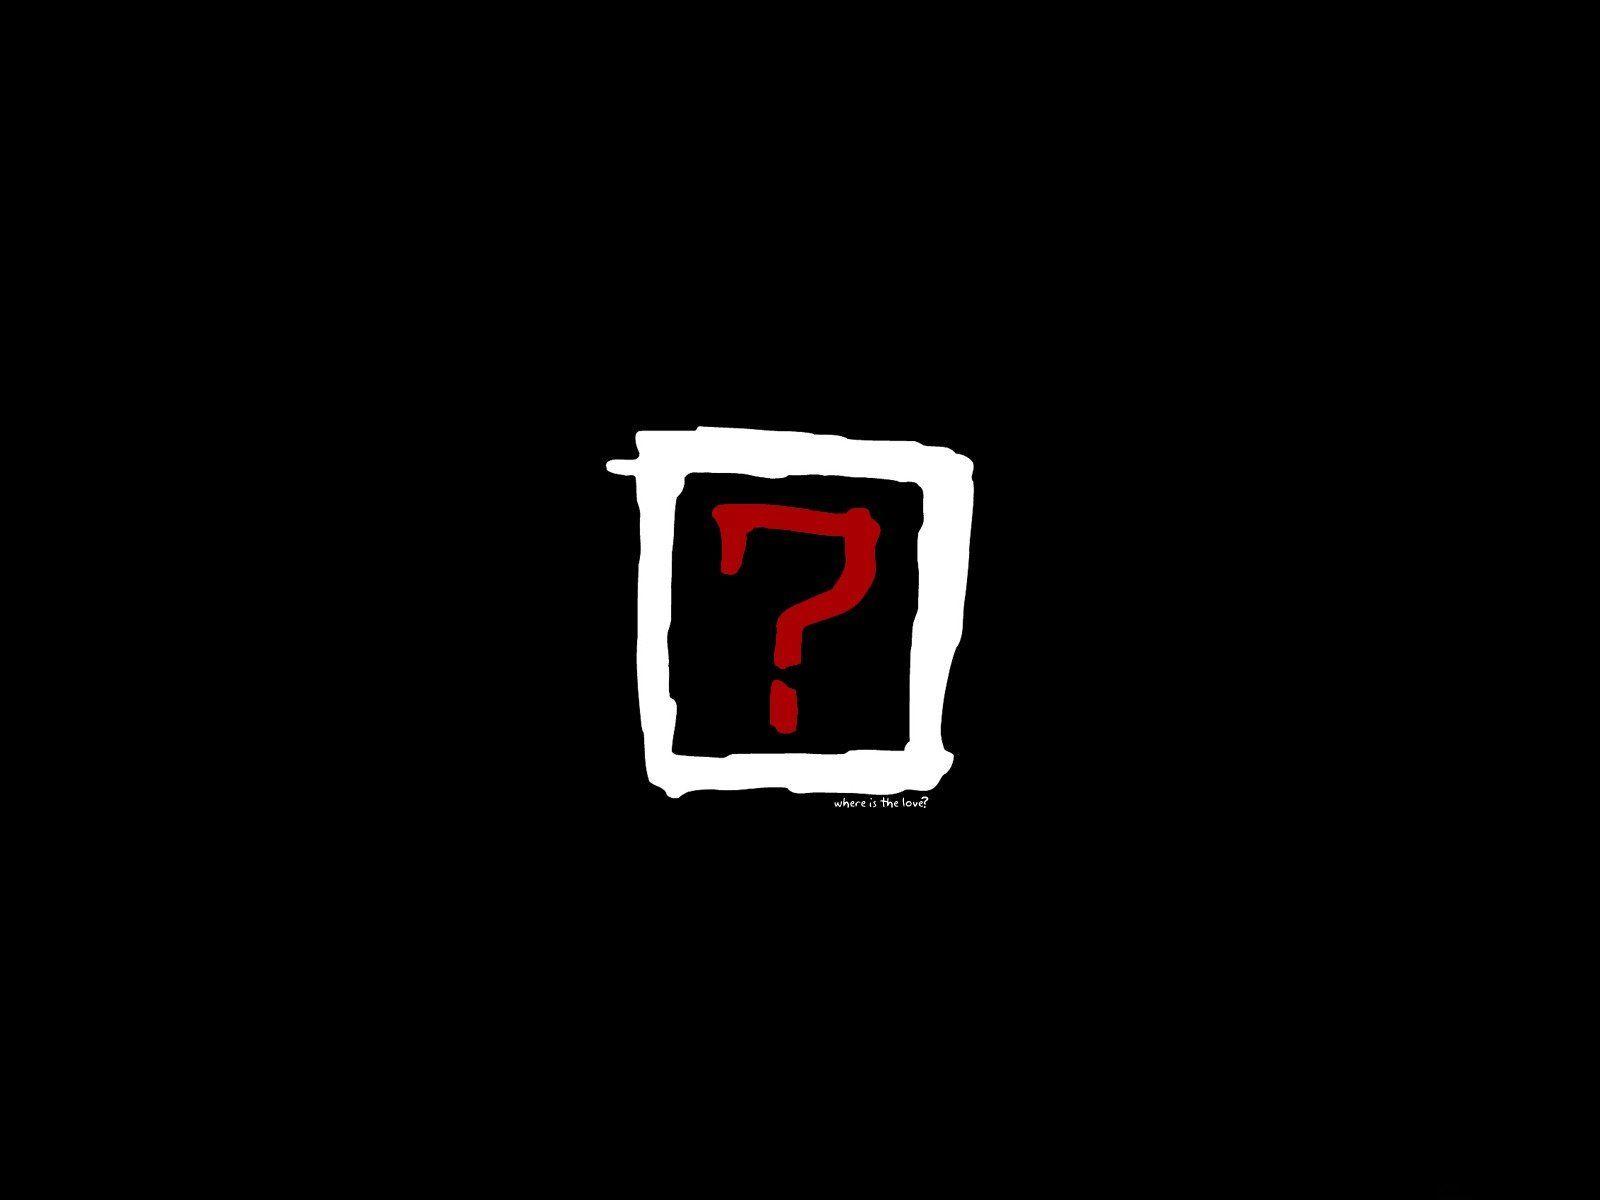 Фото вопроса знака на аву